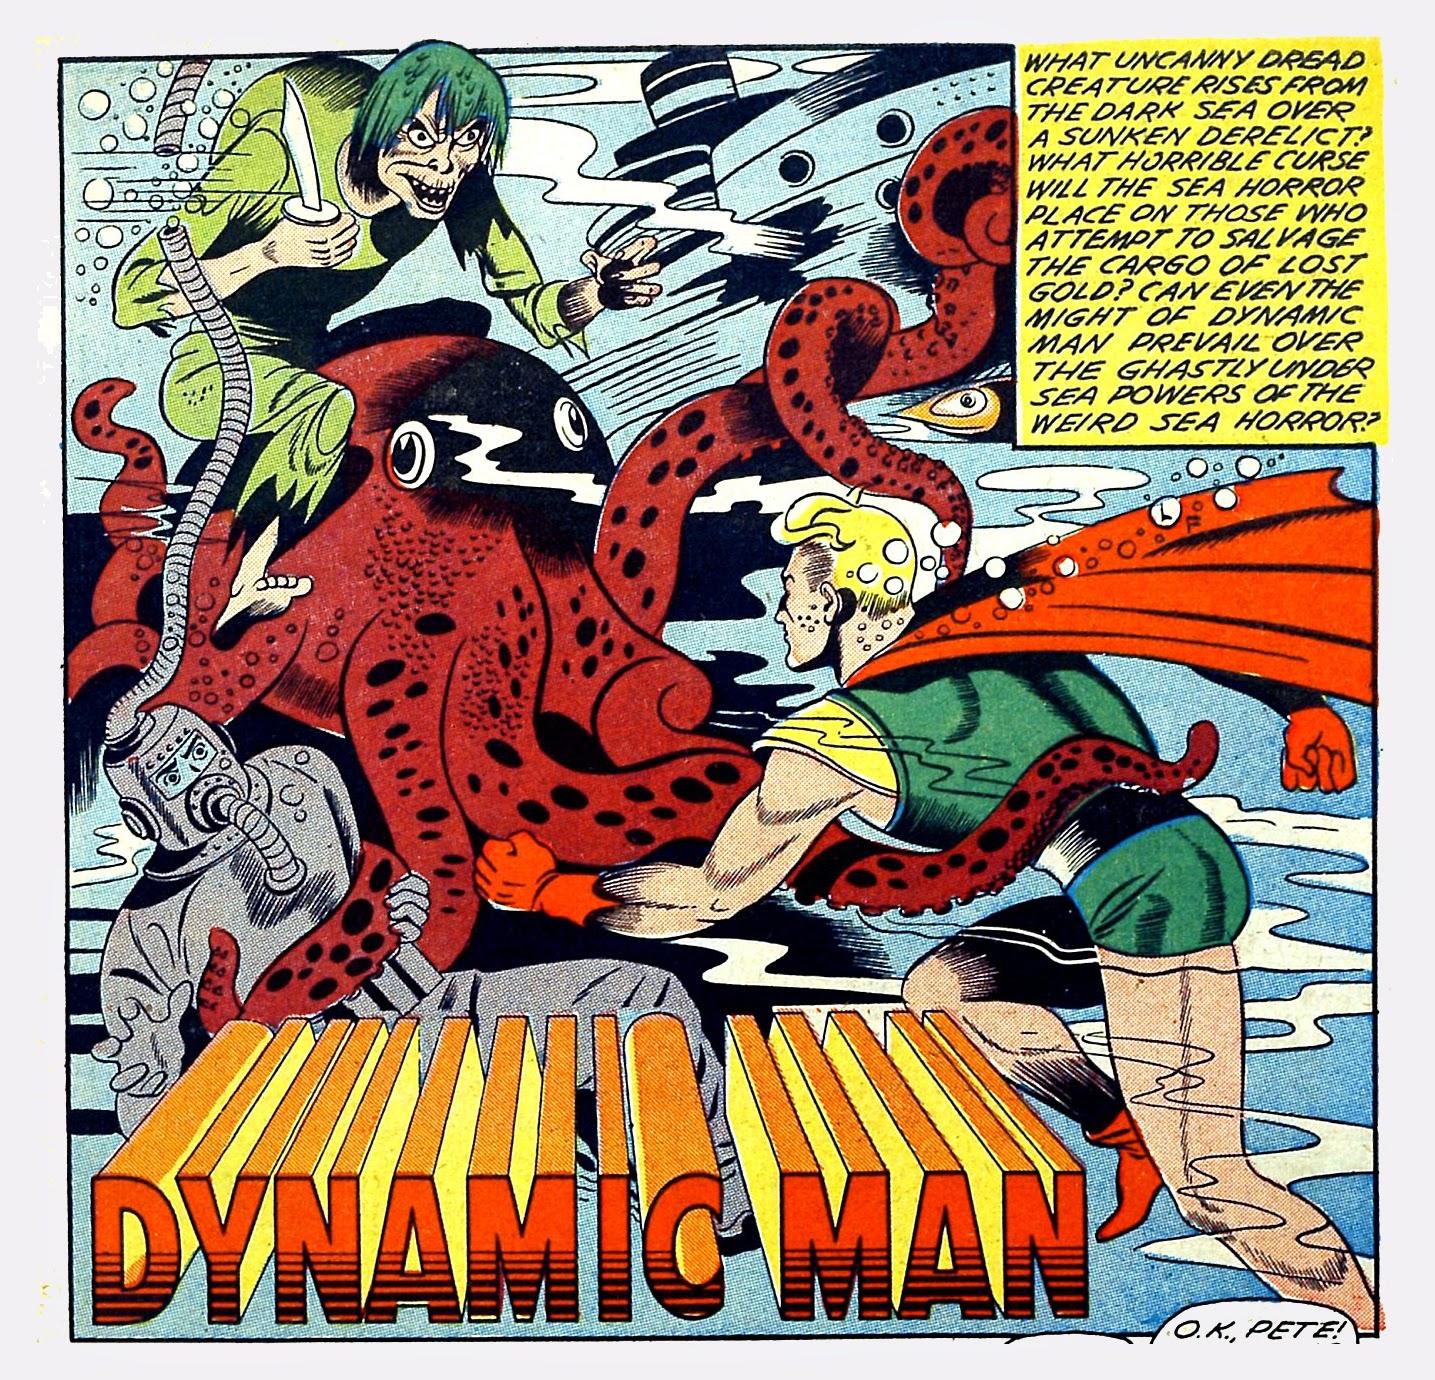 Dynamic Comics No.9 -theseahorror